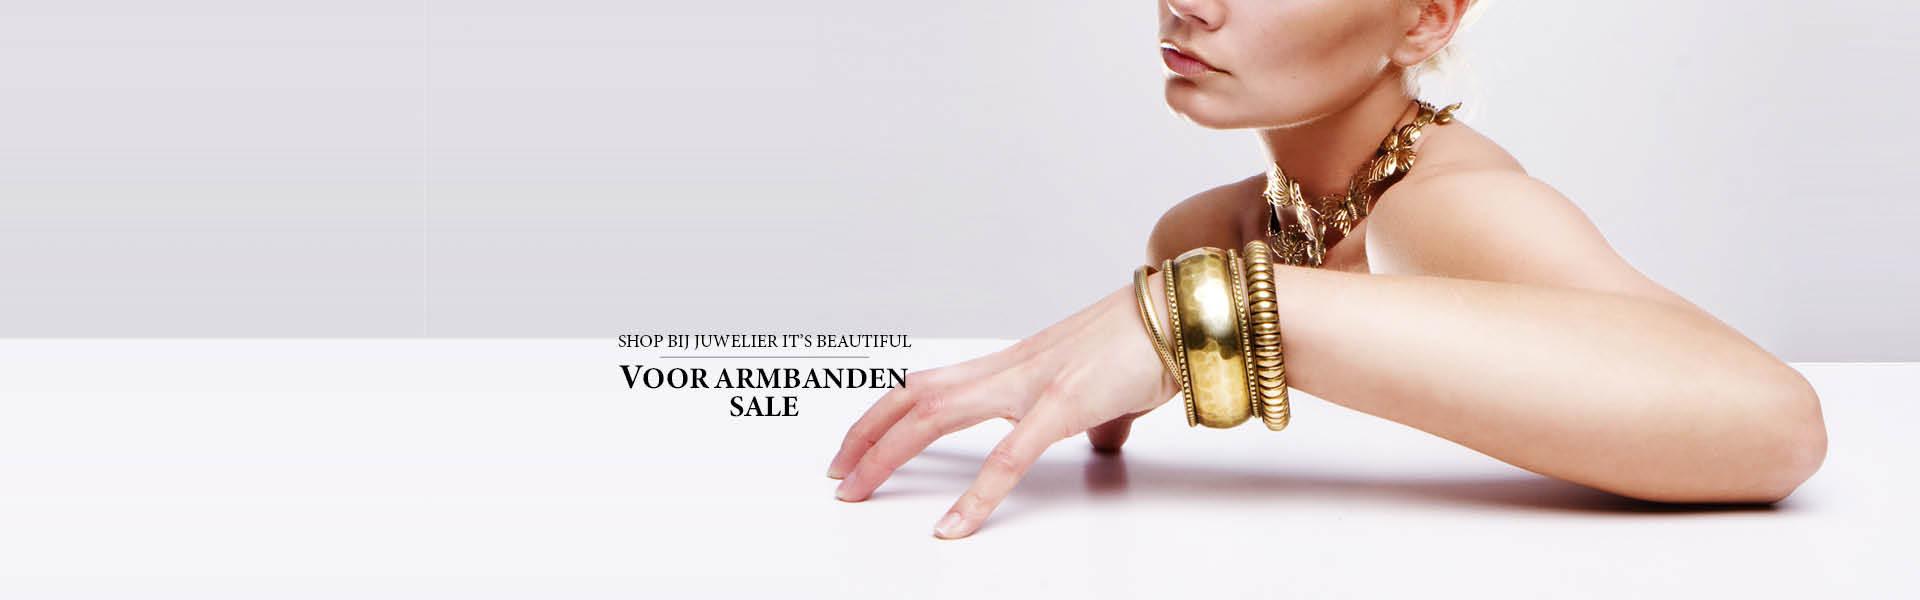 Armbanden Sale